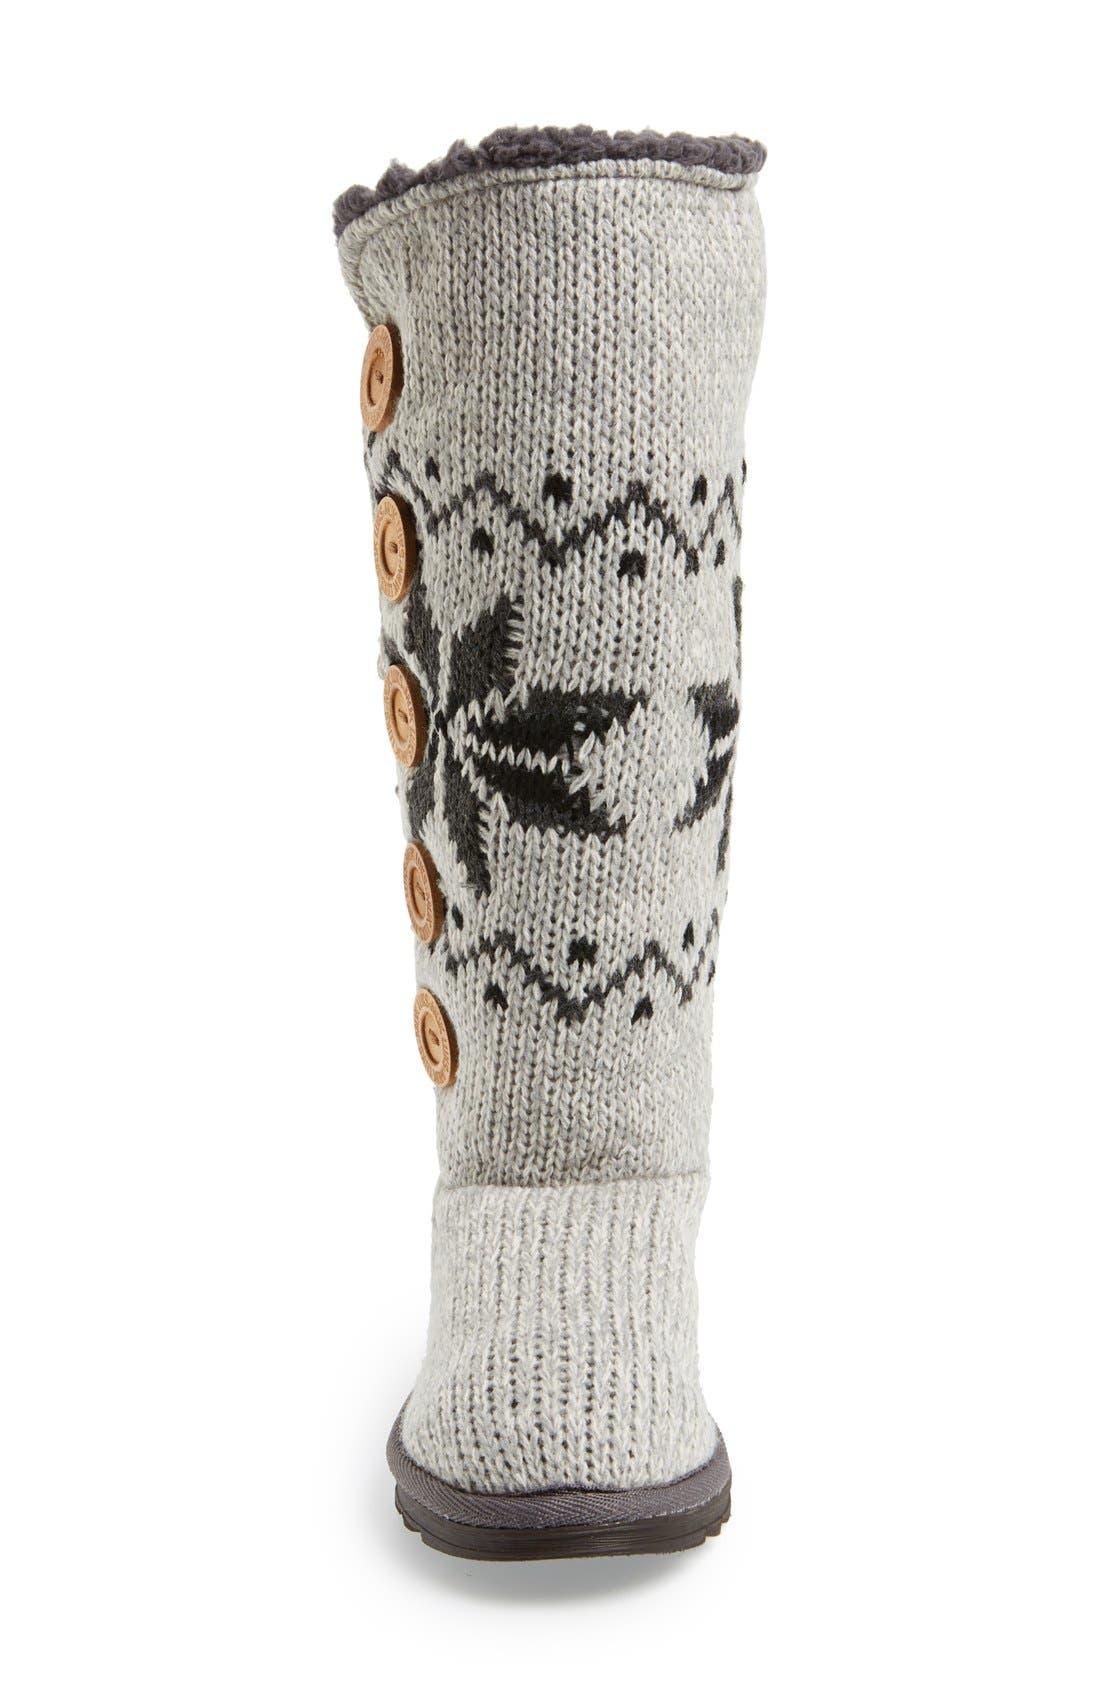 Alternate Image 3  - MUK LUKS 'Malena' Button Up Crochet Boot (Women)